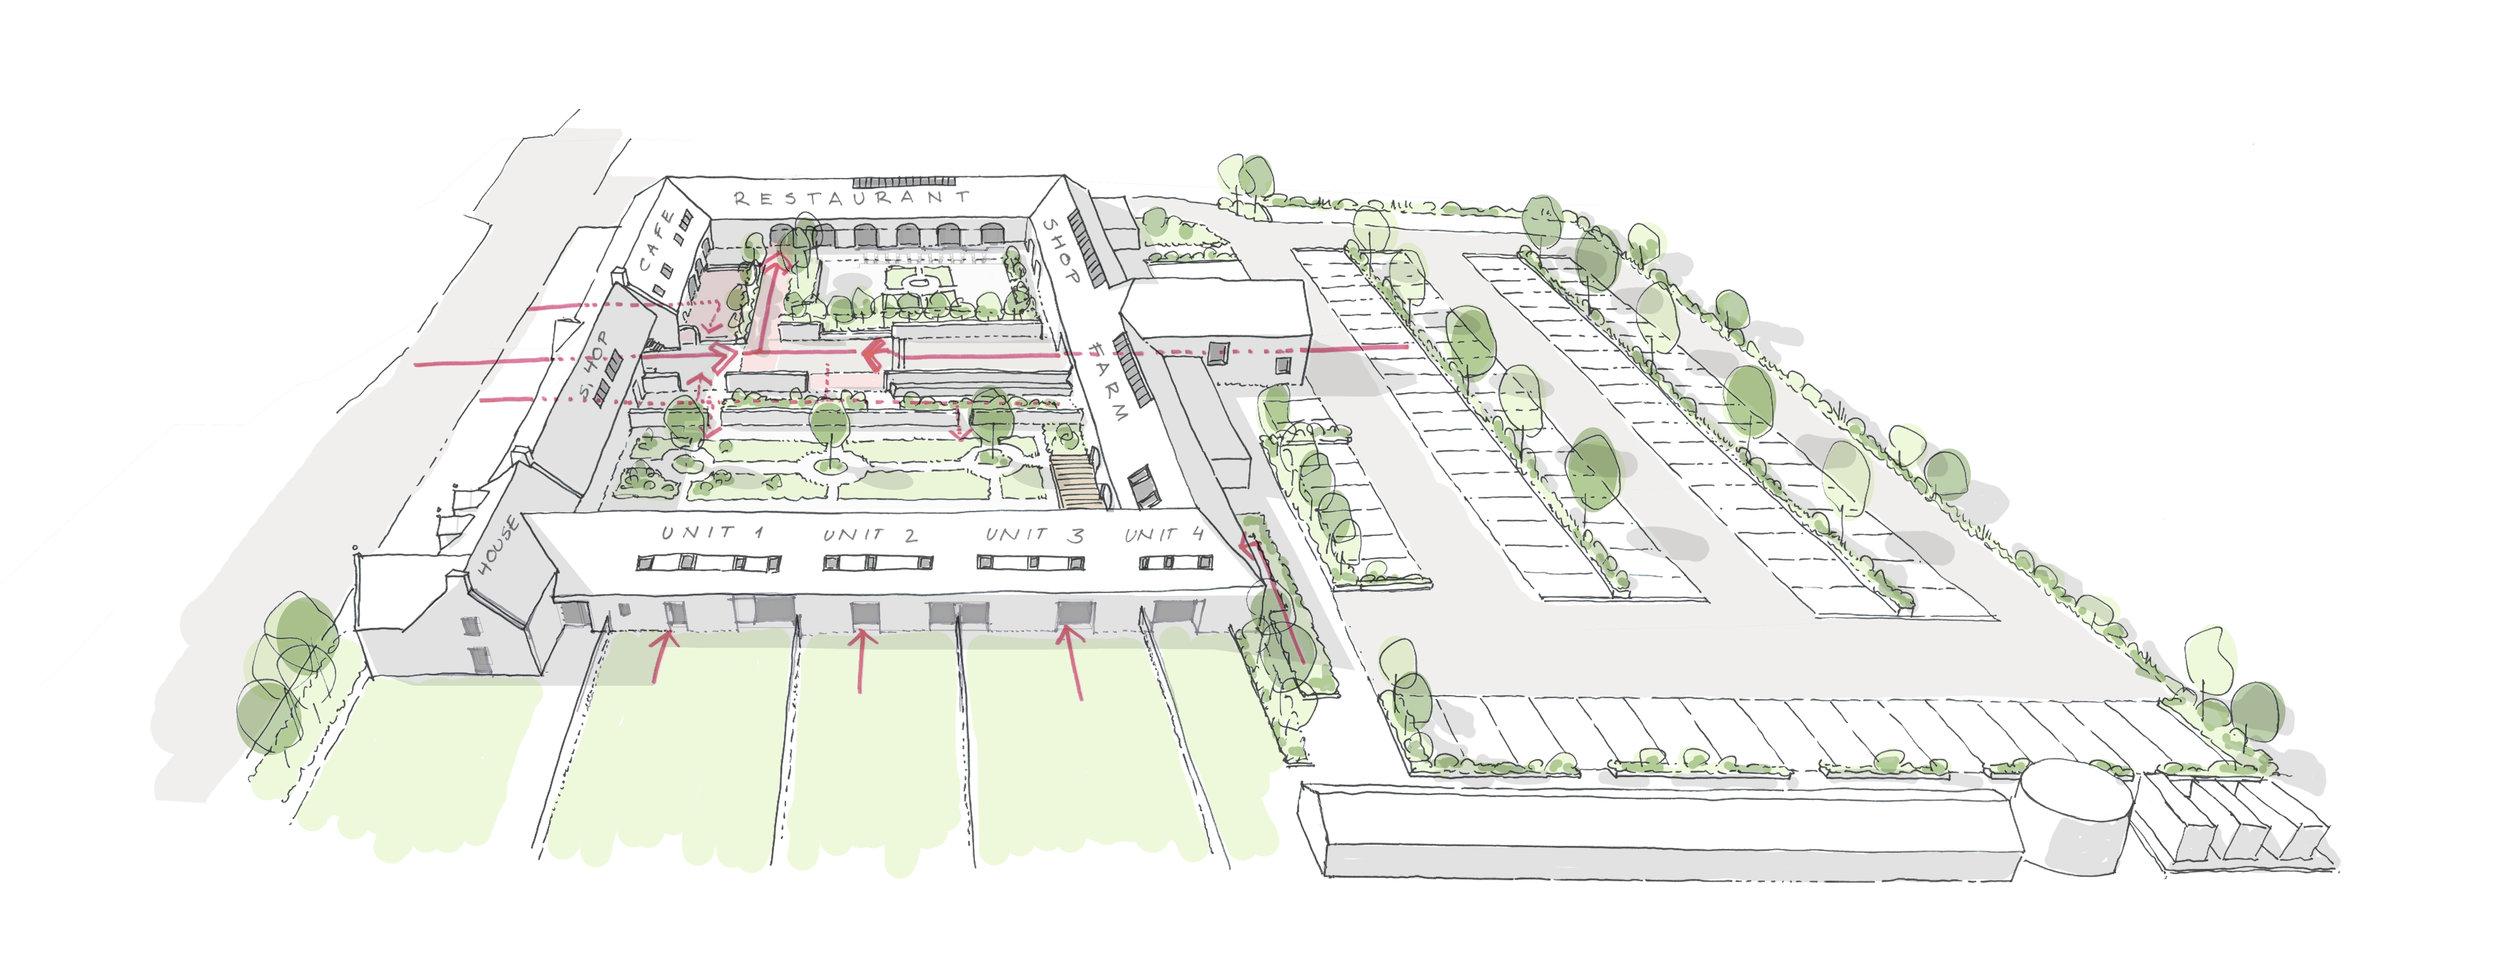 170907 courtyard diagram.jpg